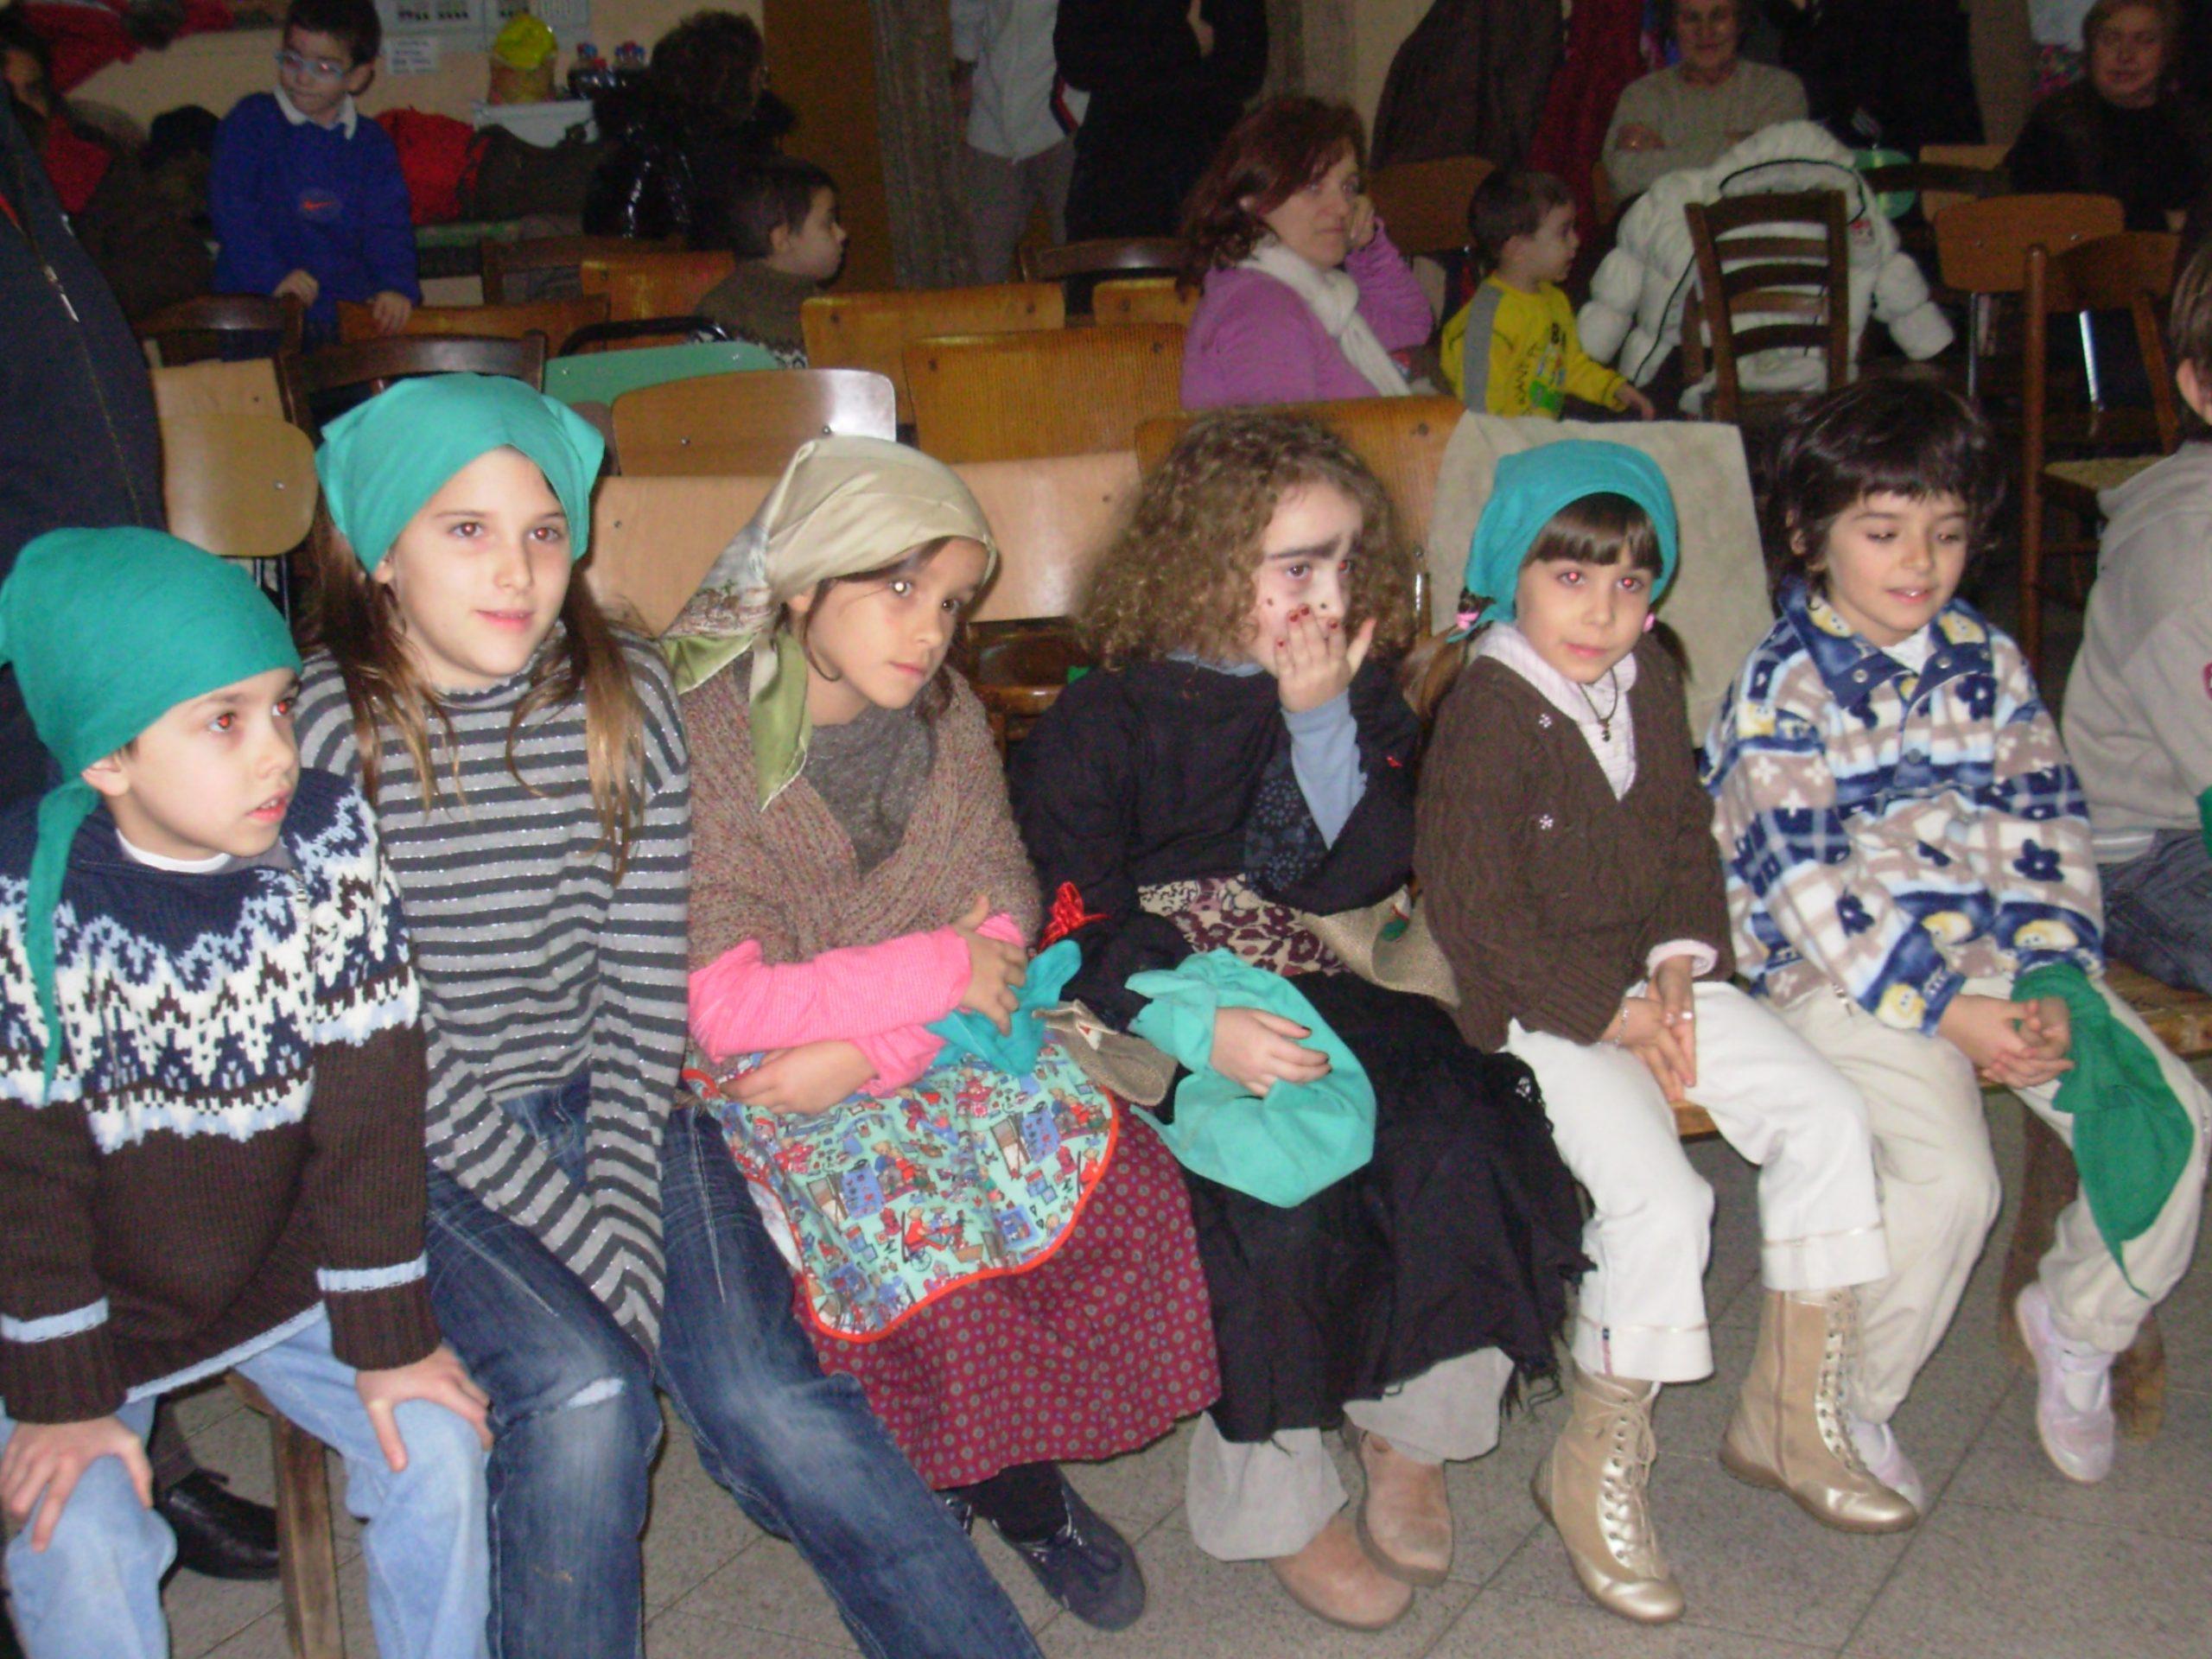 Festa befana - 6 gennaio 2008 (14)